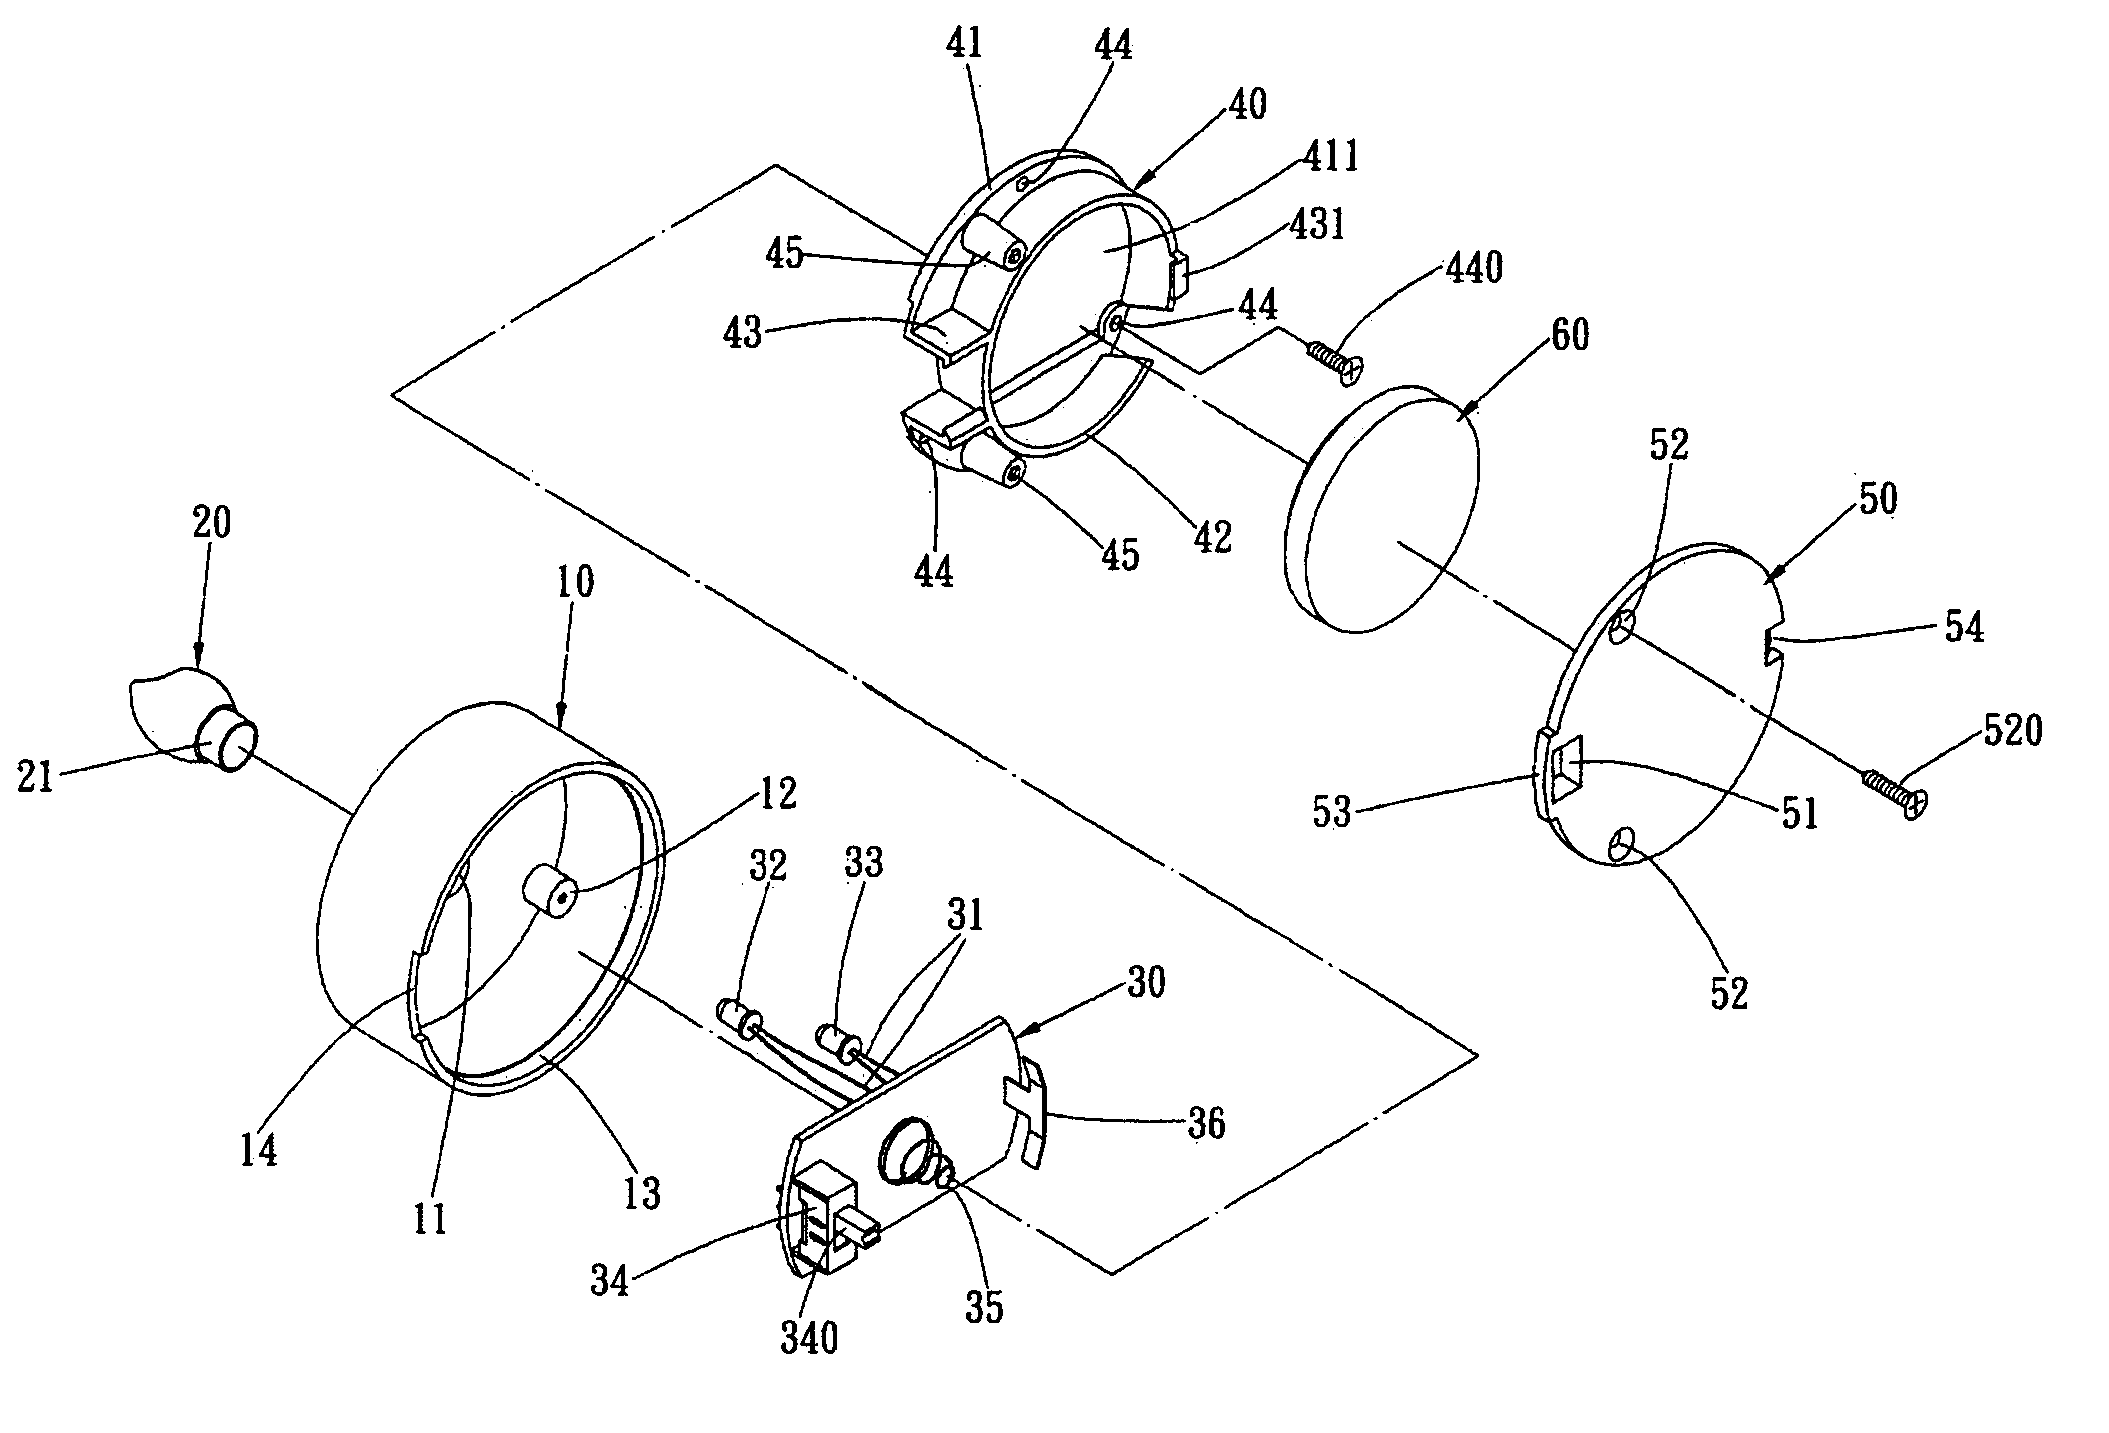 patent us7178939 - electronic simulation candle